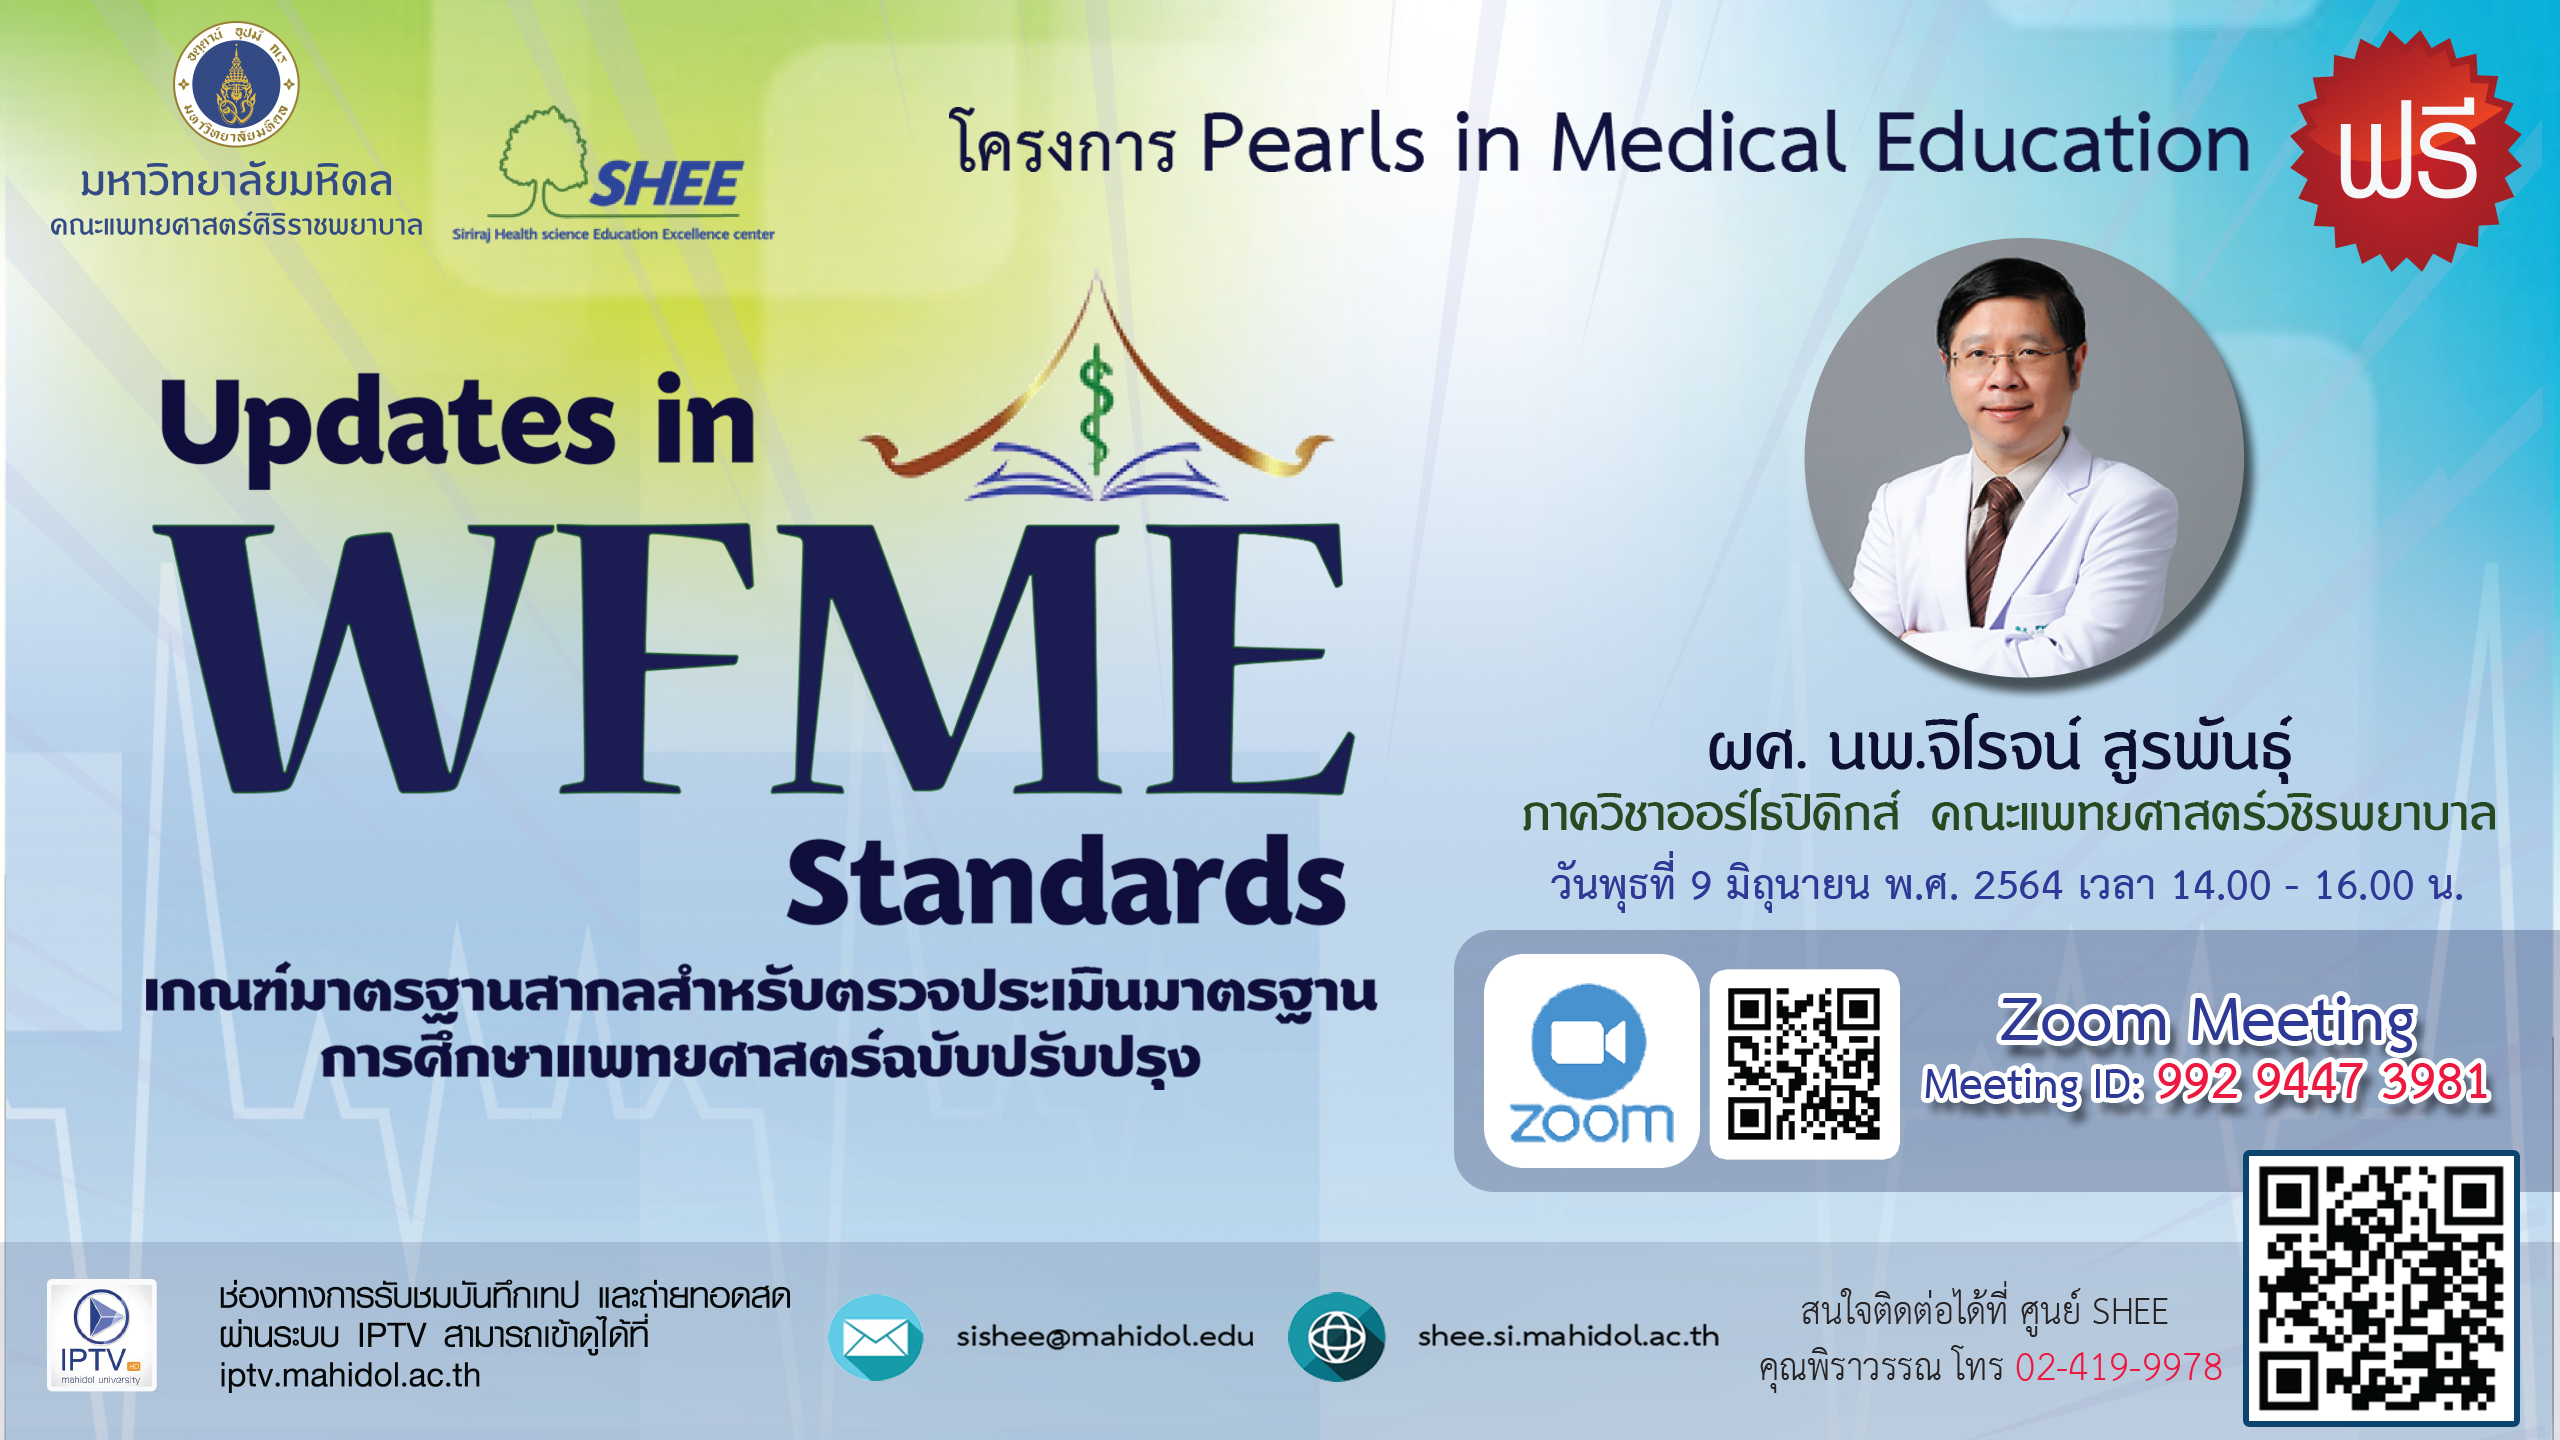 Updates in WFME  standards @ คณะแพทยศาสตร์ศิริราชพยาบาล